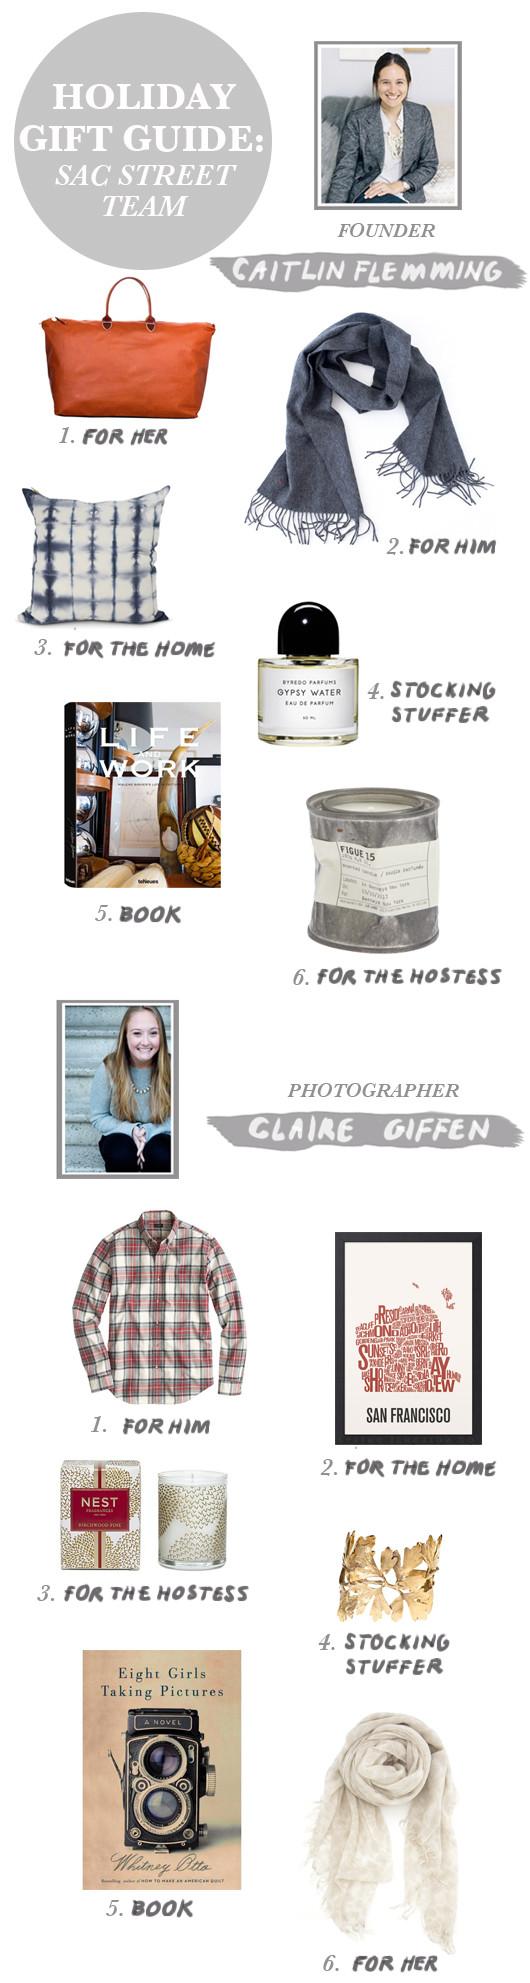 Gift Guide: Sac Street Team (Caitlin & Claire) | Sacramento Street